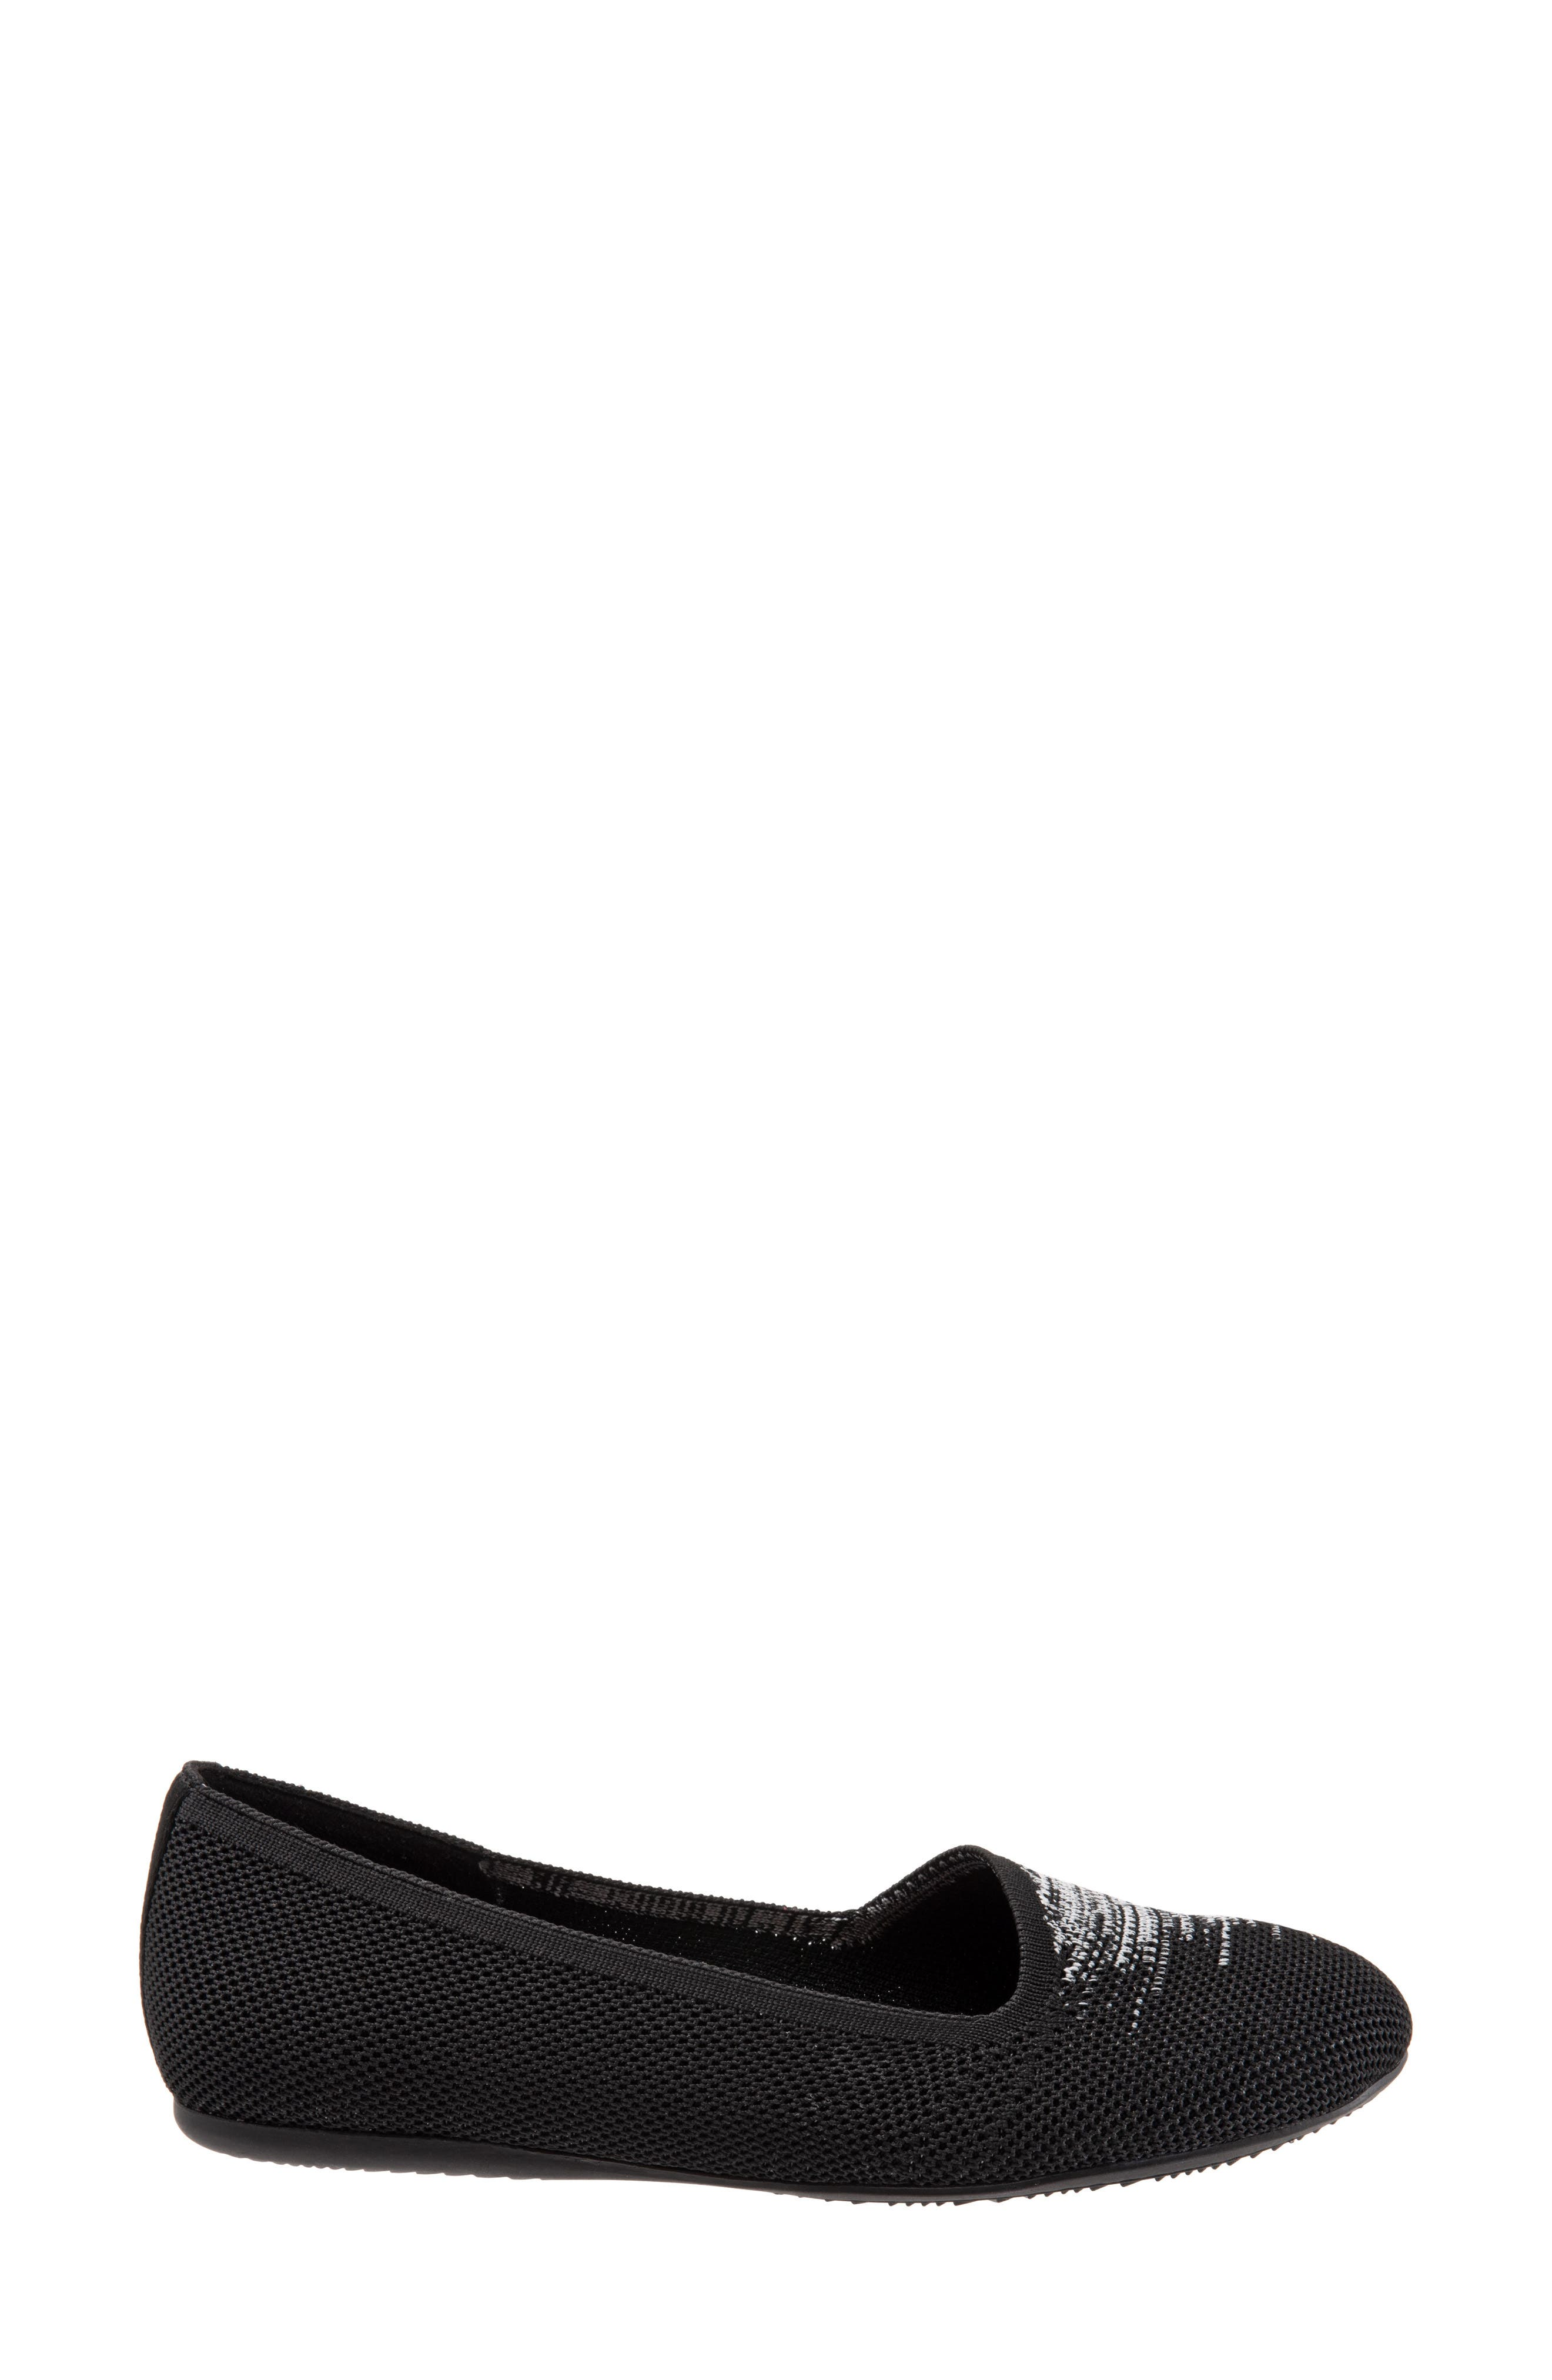 Sicily Knit Flat,                             Alternate thumbnail 3, color,                             BLACK KNIT FABRIC